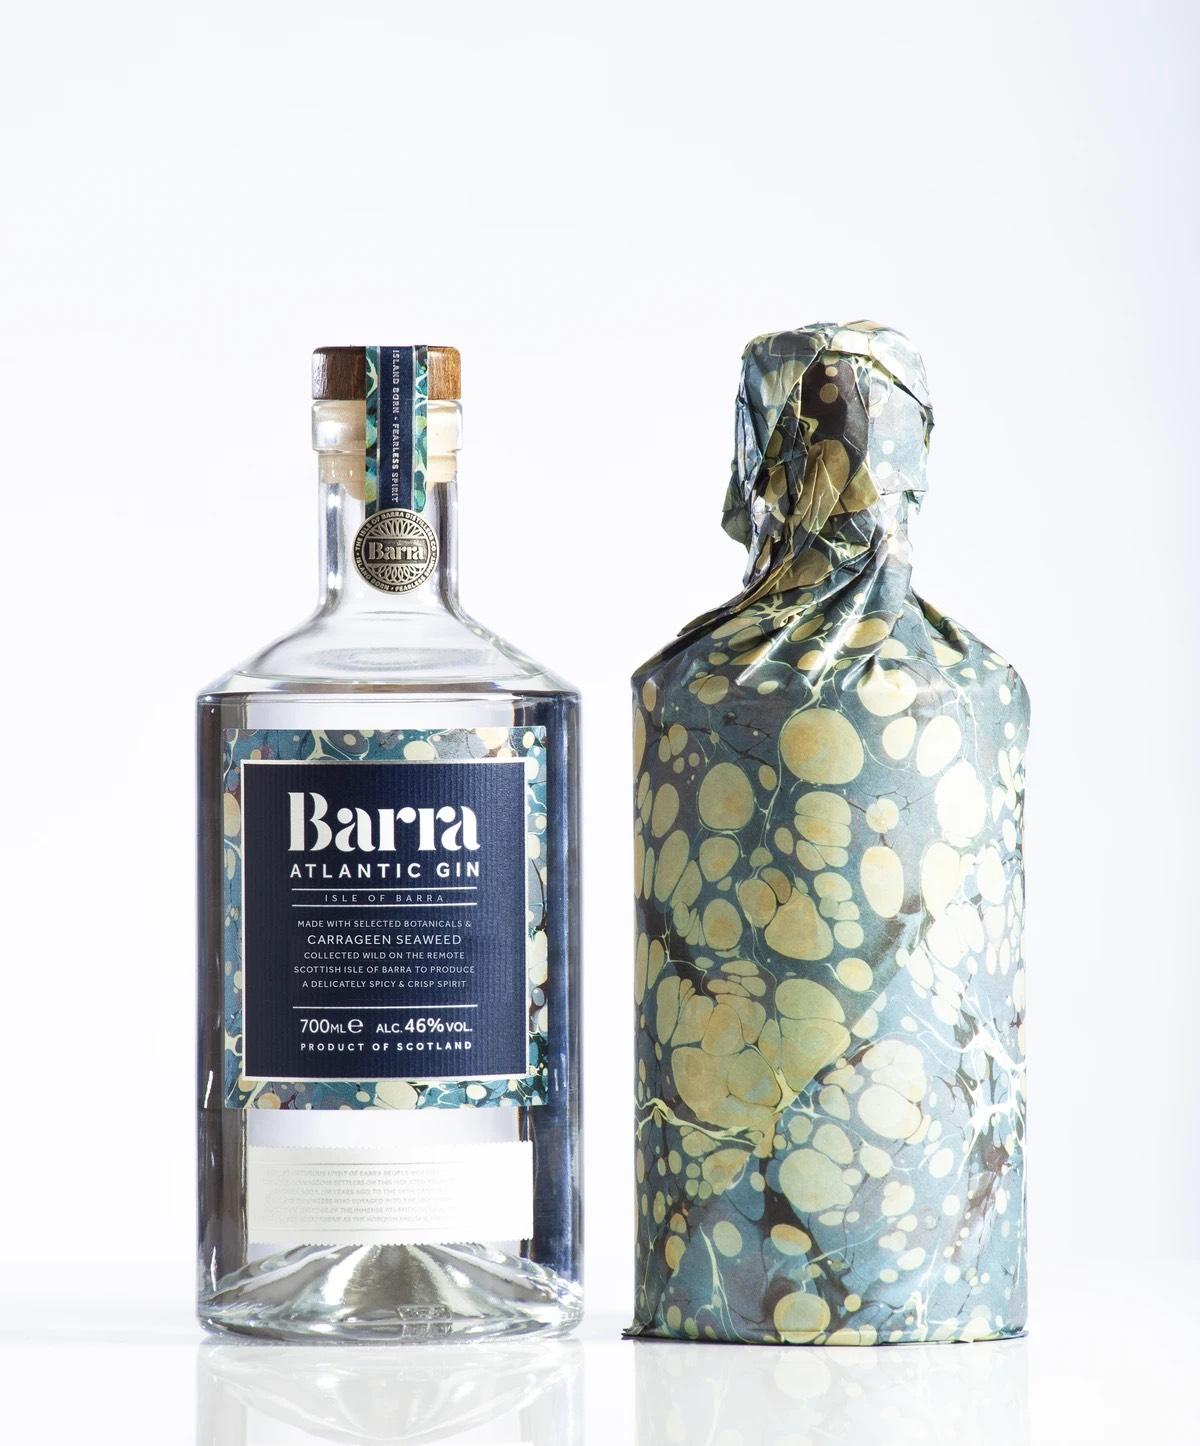 Barra Atlantic gin 700ml £30 at Isle of Barra Distillers